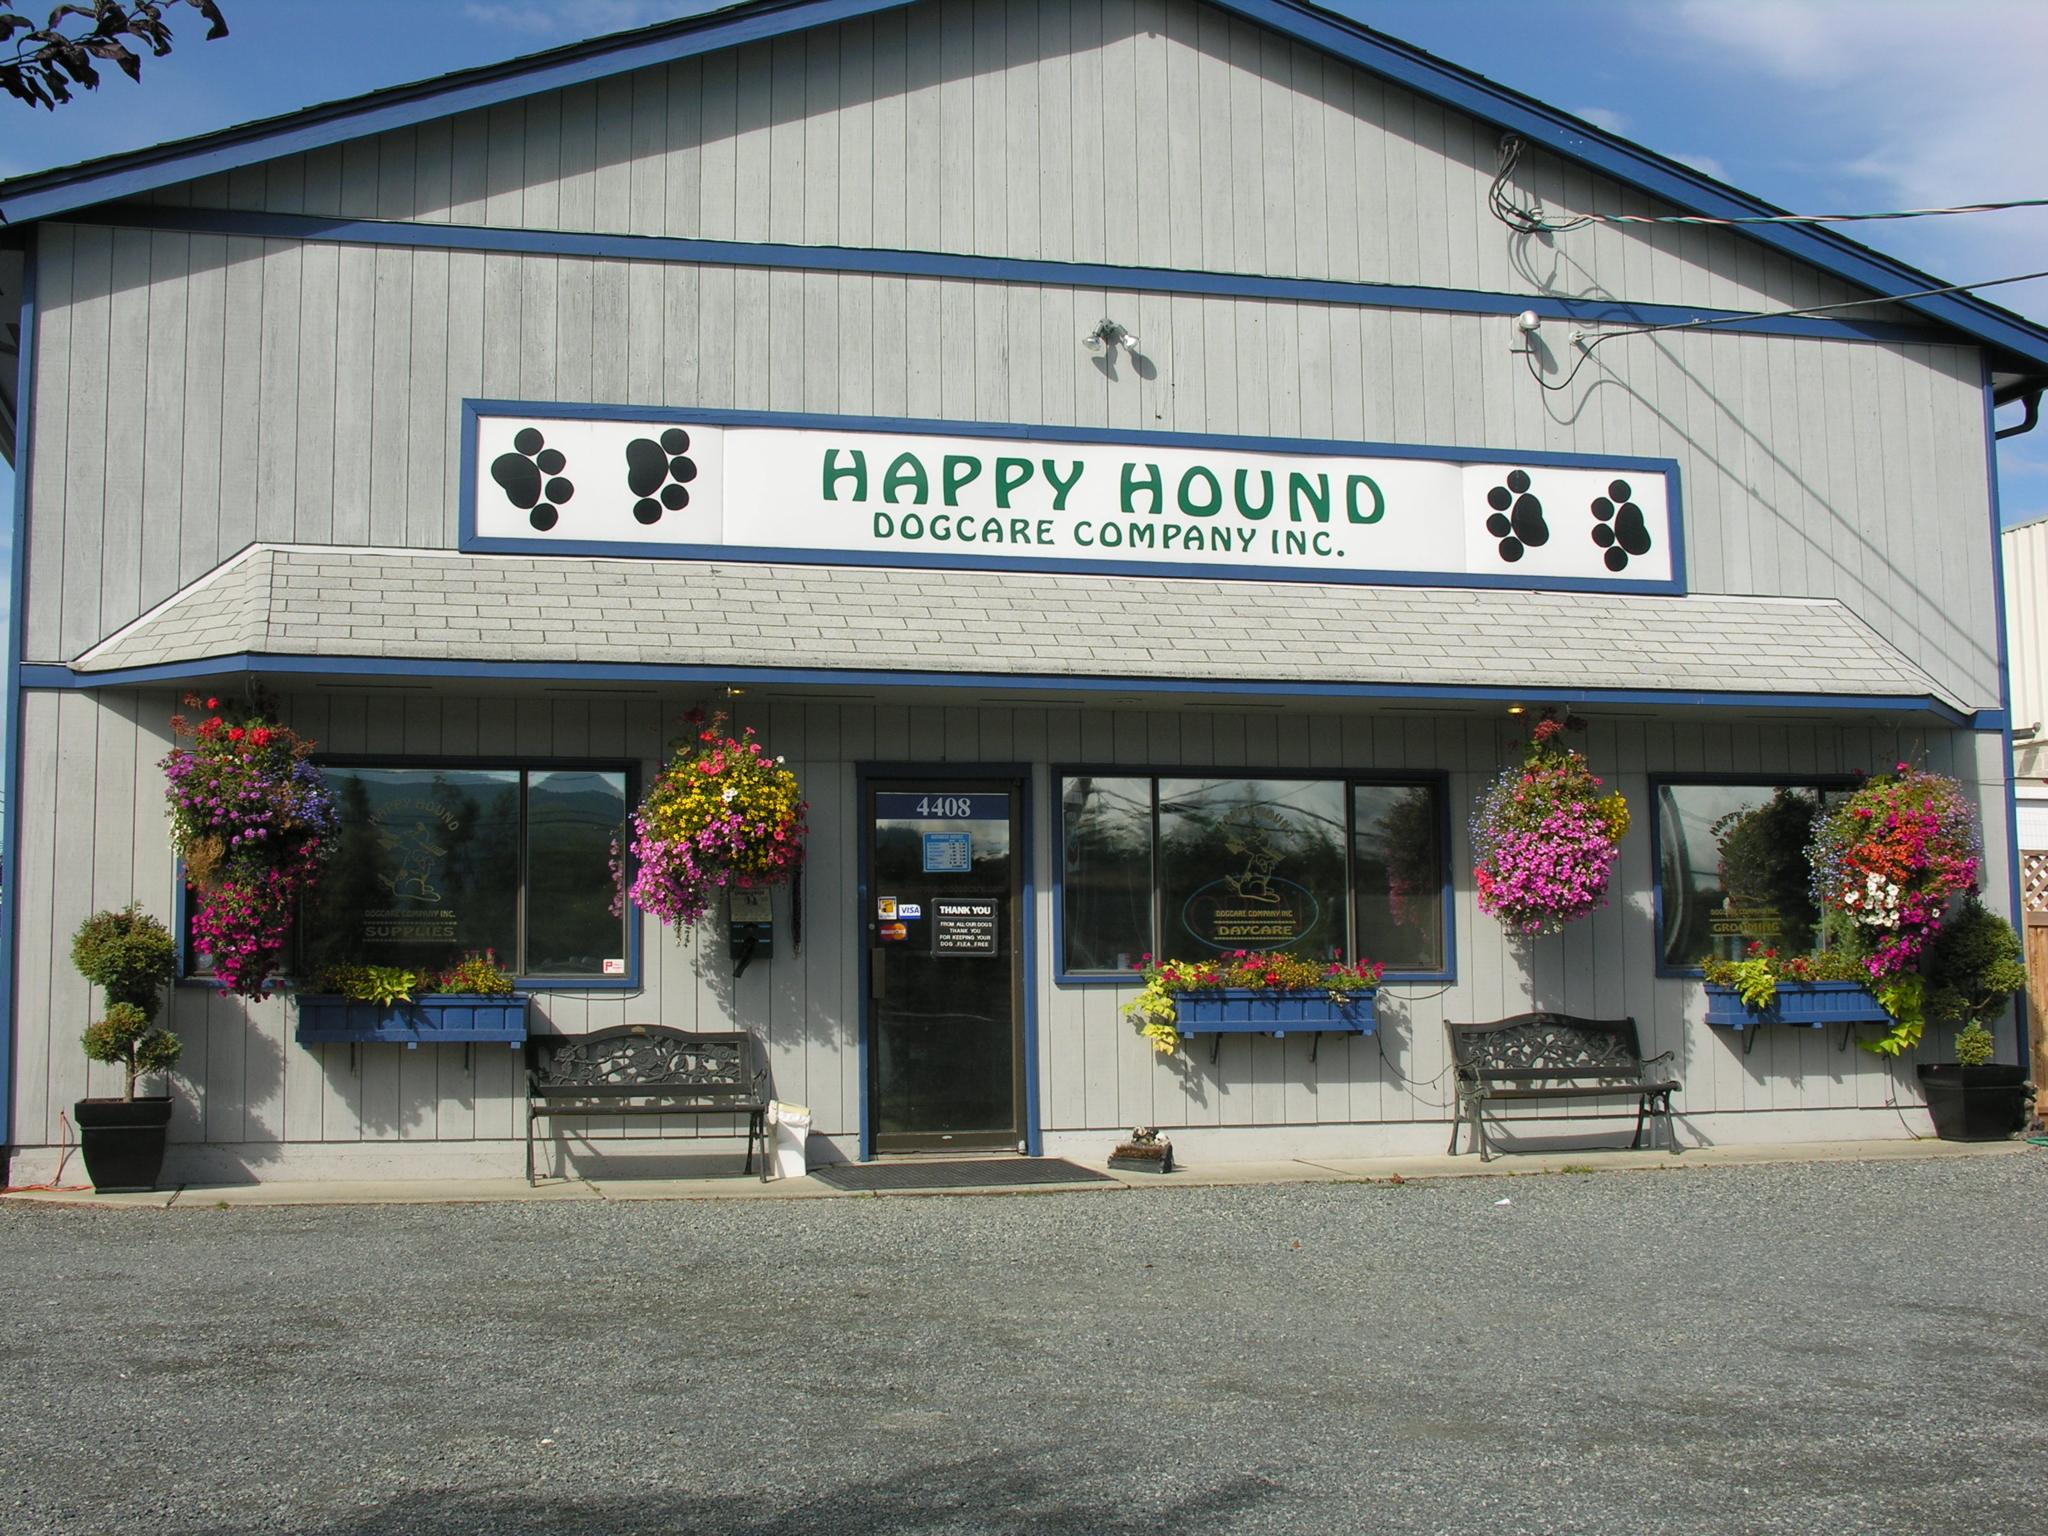 Happy Hound Dog Care Co in Nanaimo